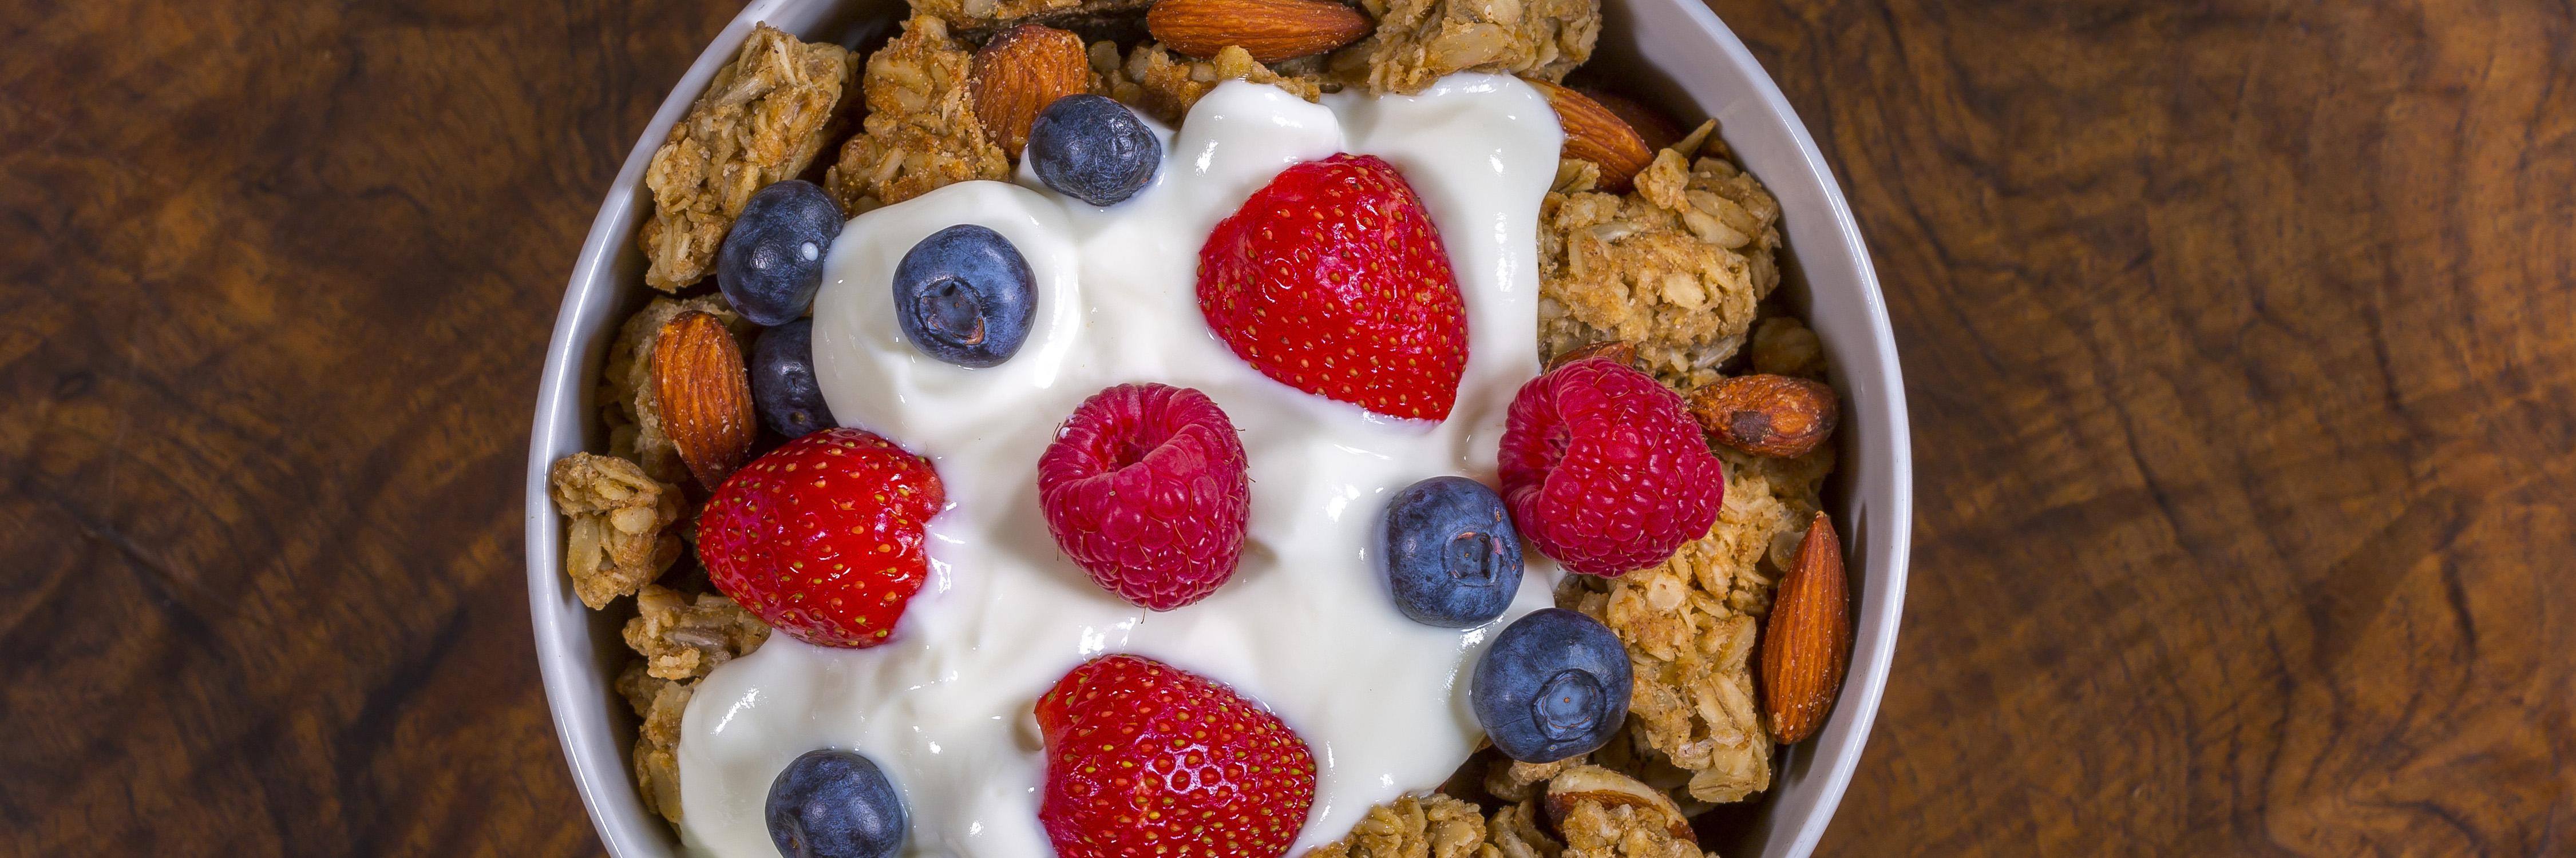 Maple & Almond with Yogurt